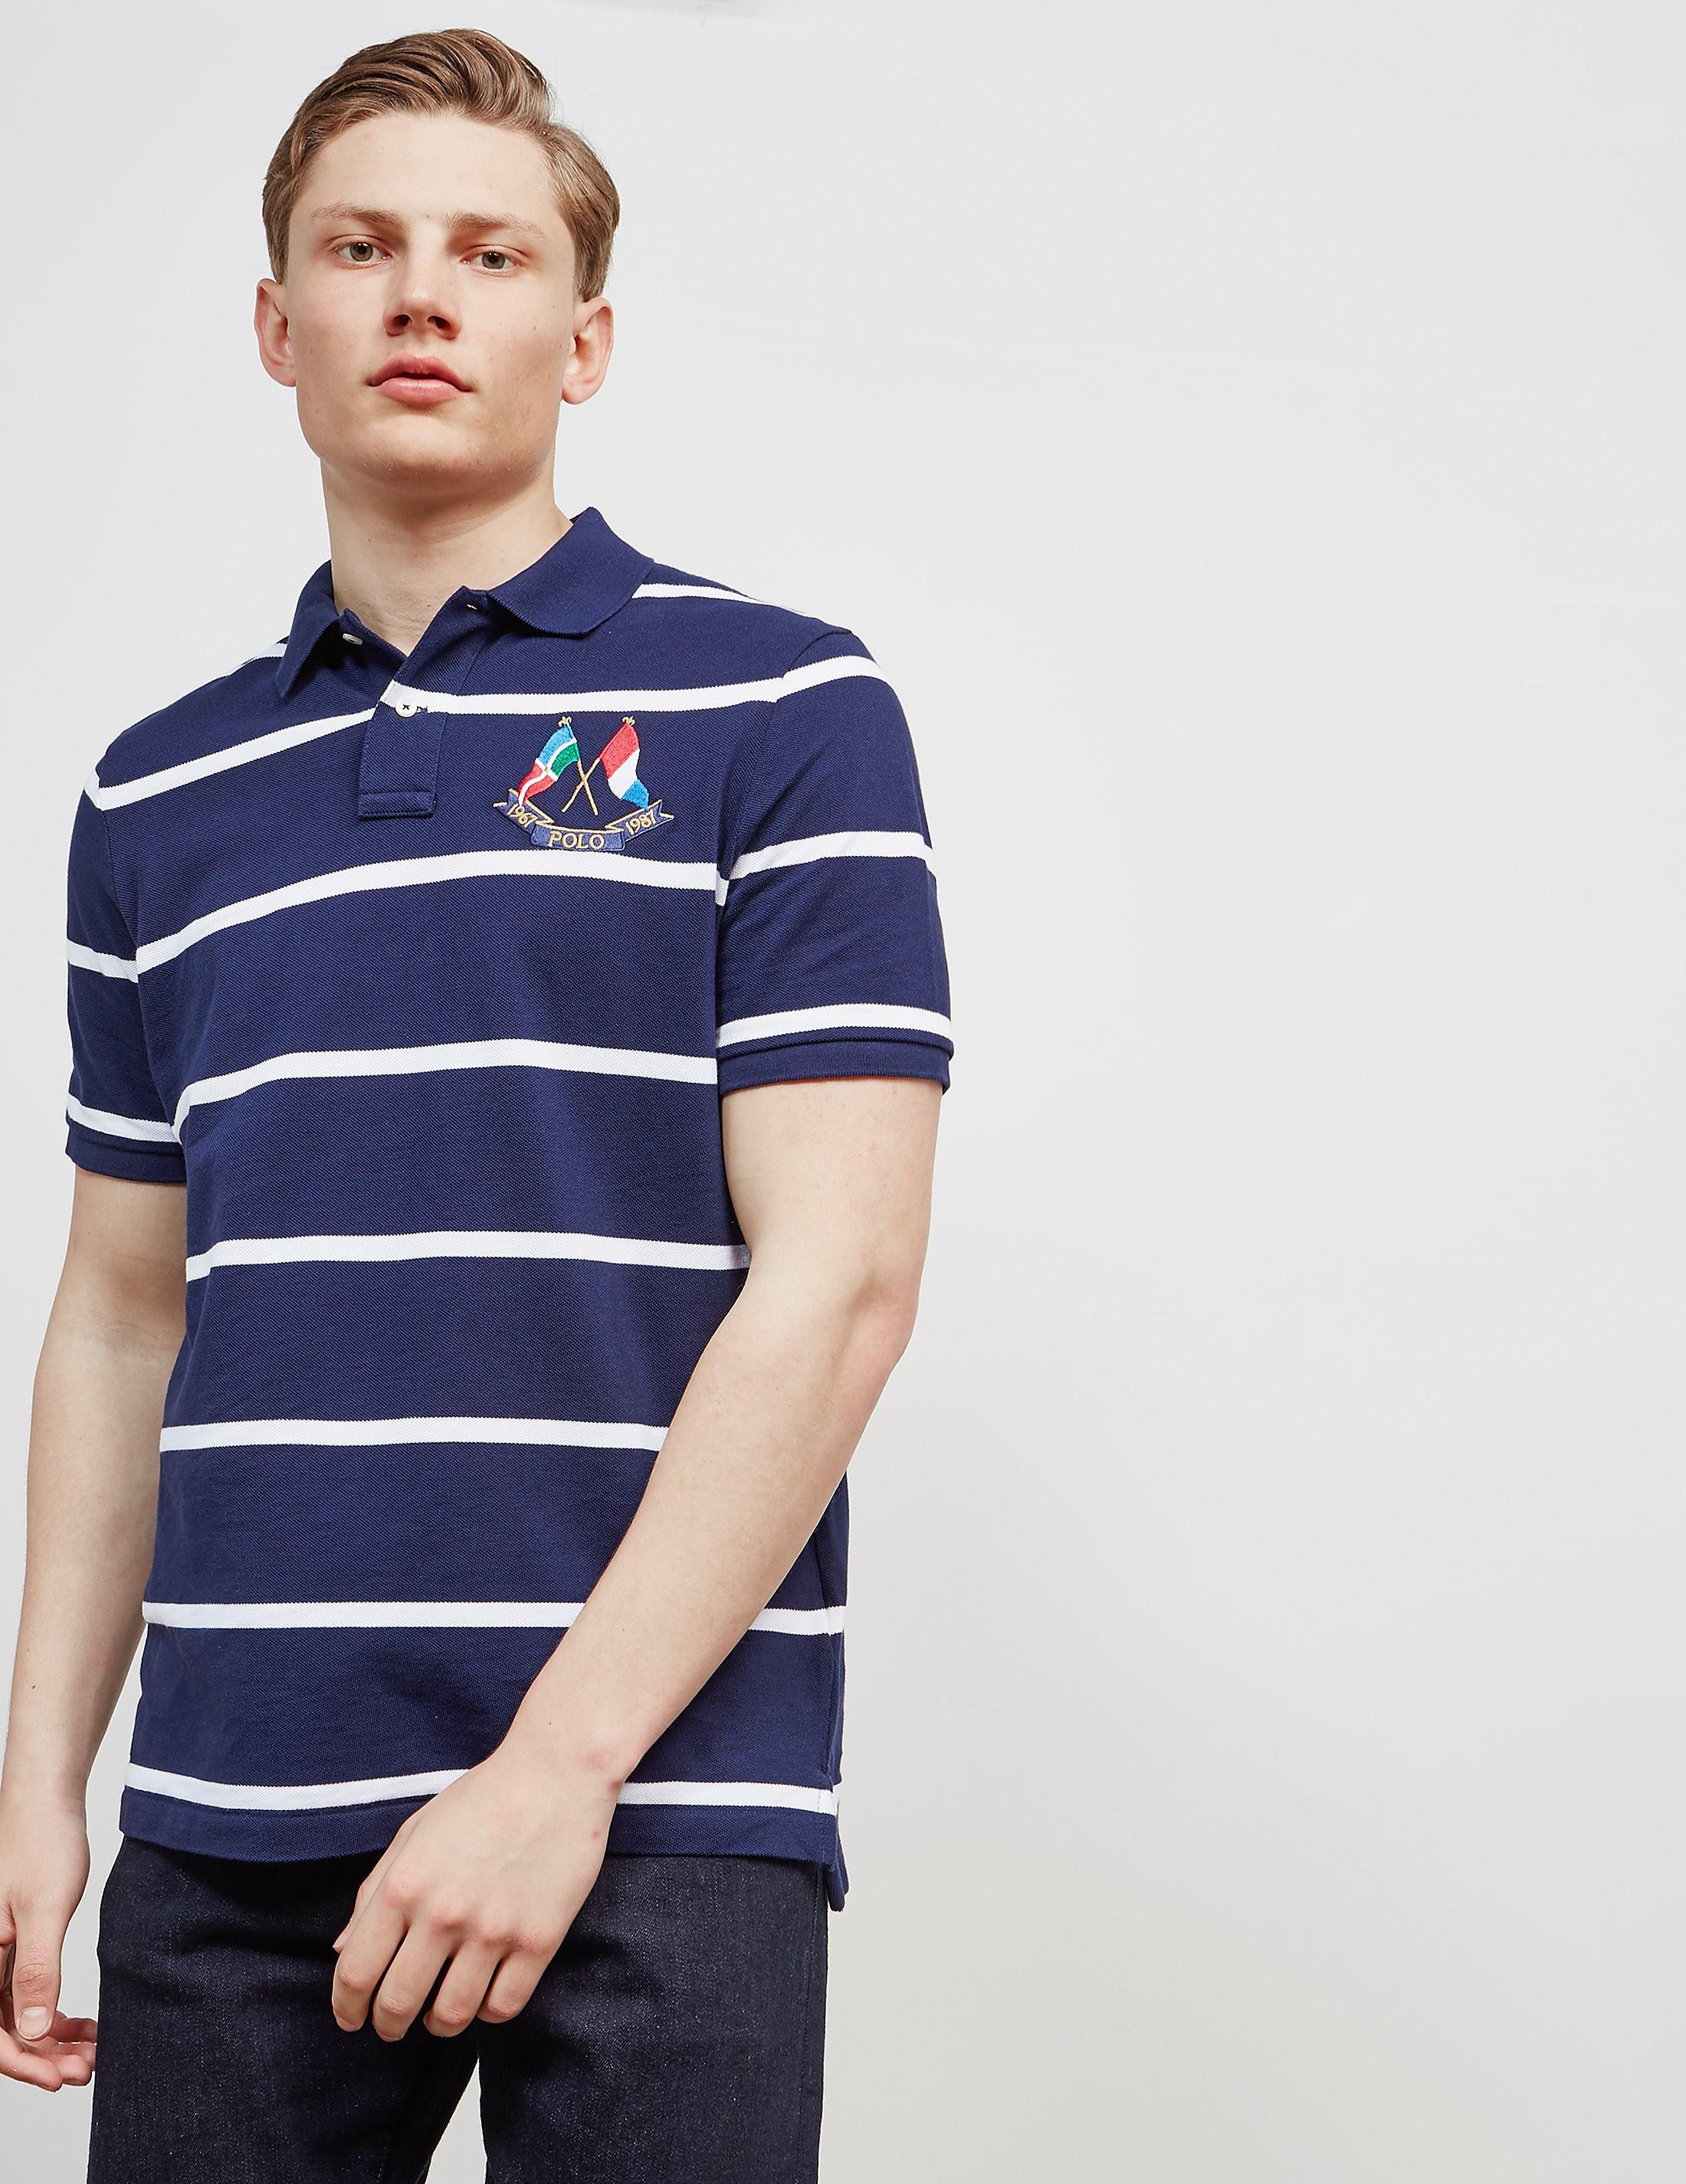 Polo Ralph Lauren CP-39 Flag Short Sleeve Polo Shirt